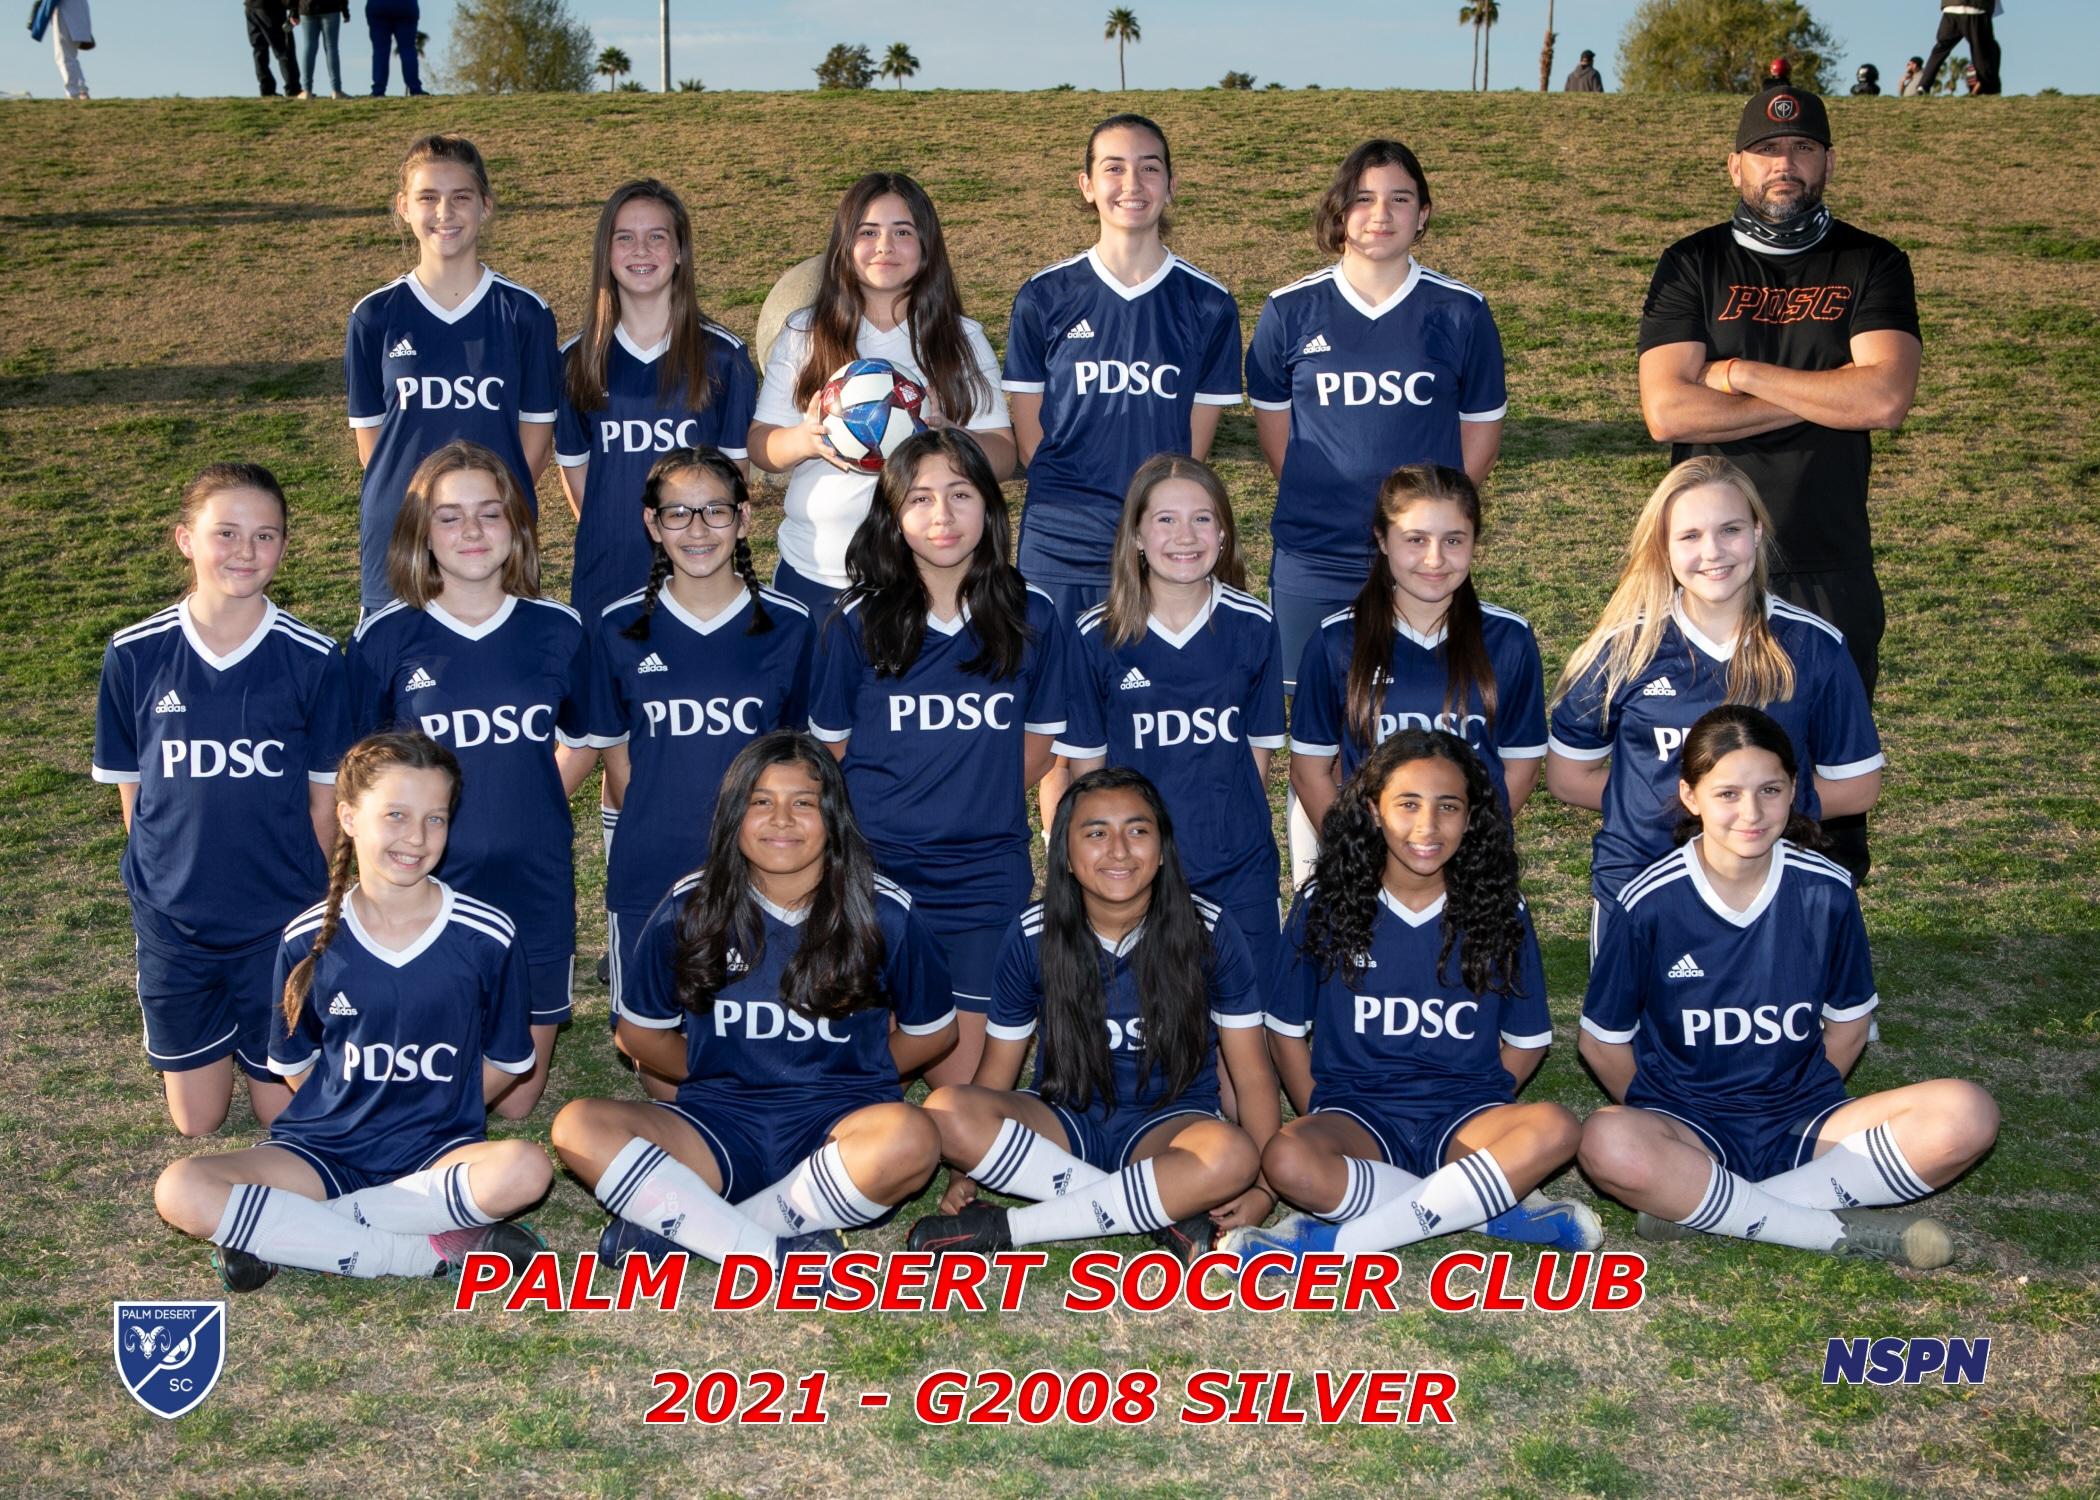 Palm Desert Soccer Club G2008 Silver